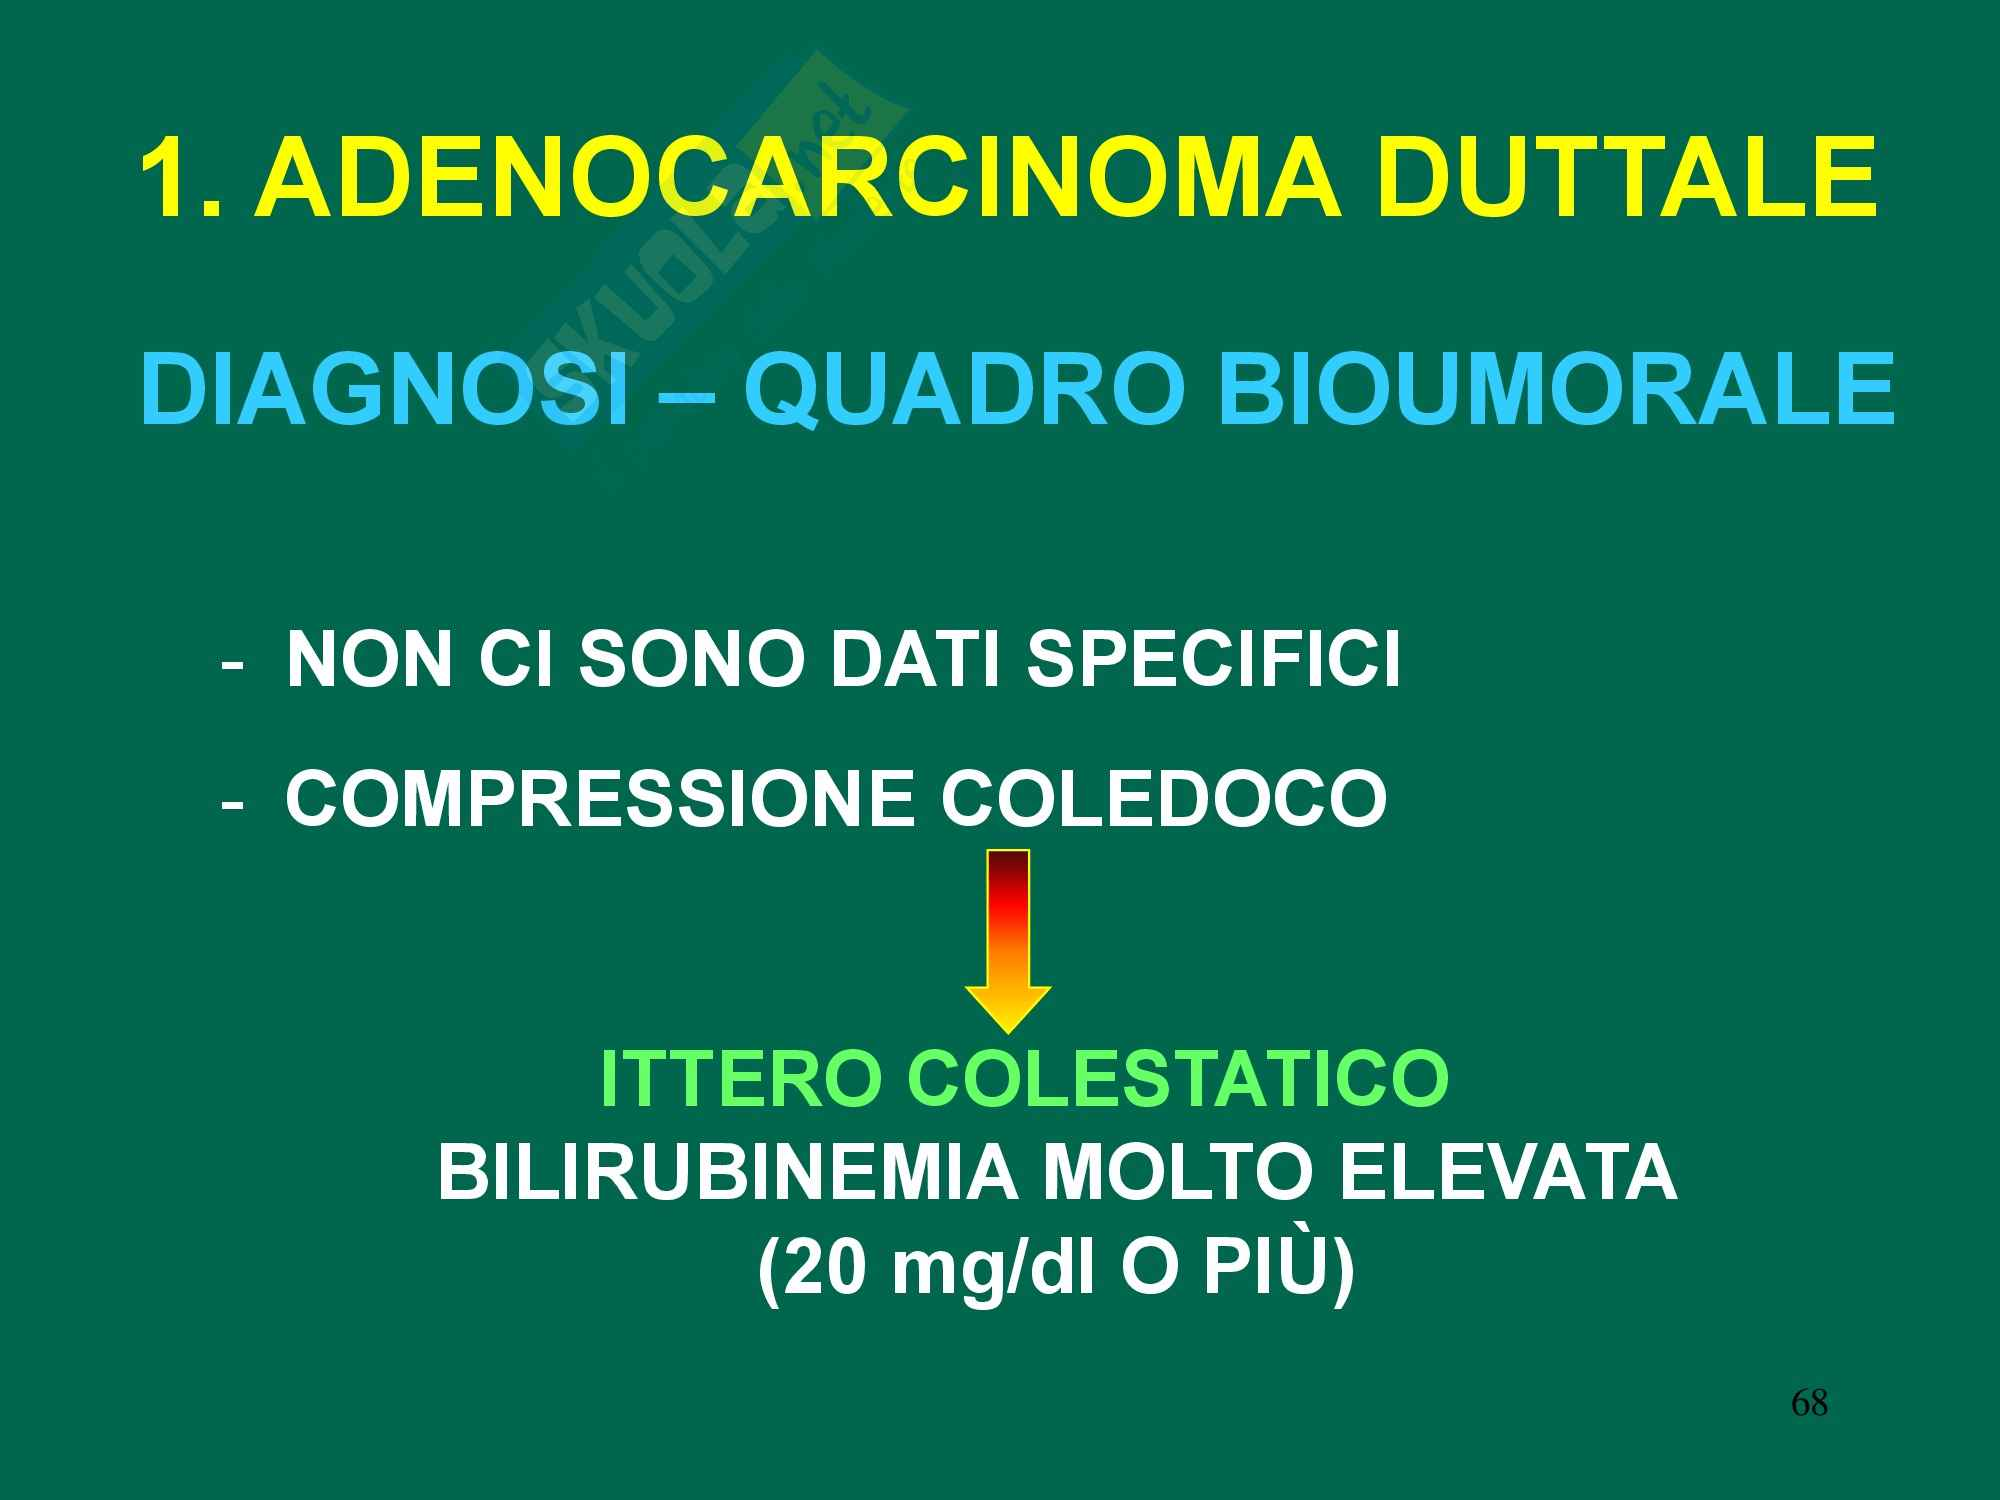 Chirurgia dell'apparato digerente - Tumori pancreas Pag. 11